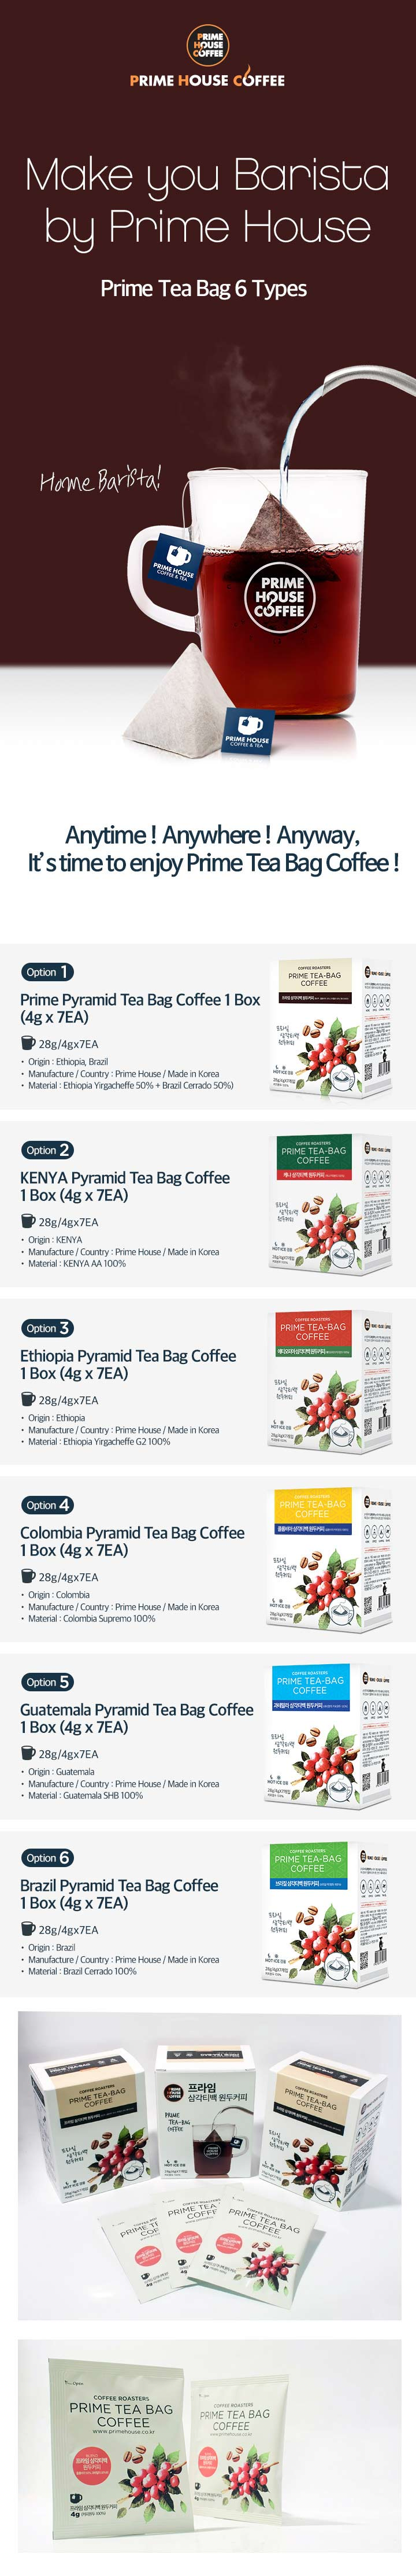 Prime Pyramid Tea Bag Coffee Series